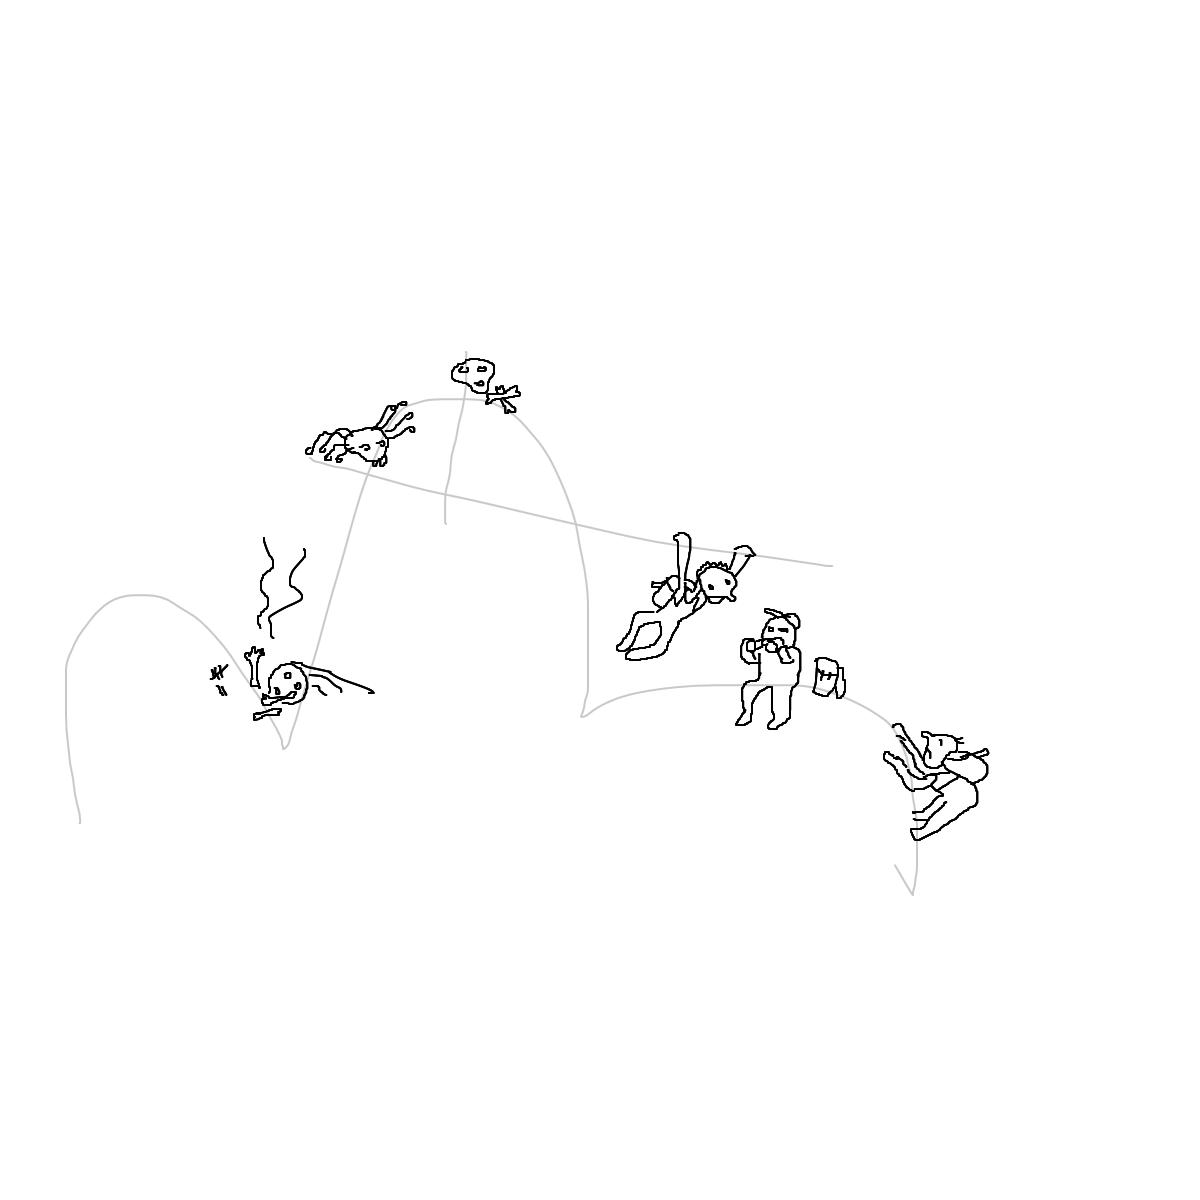 BAAAM drawing#3880 lat:62.0627365112304700lng: 22.8076133728027340